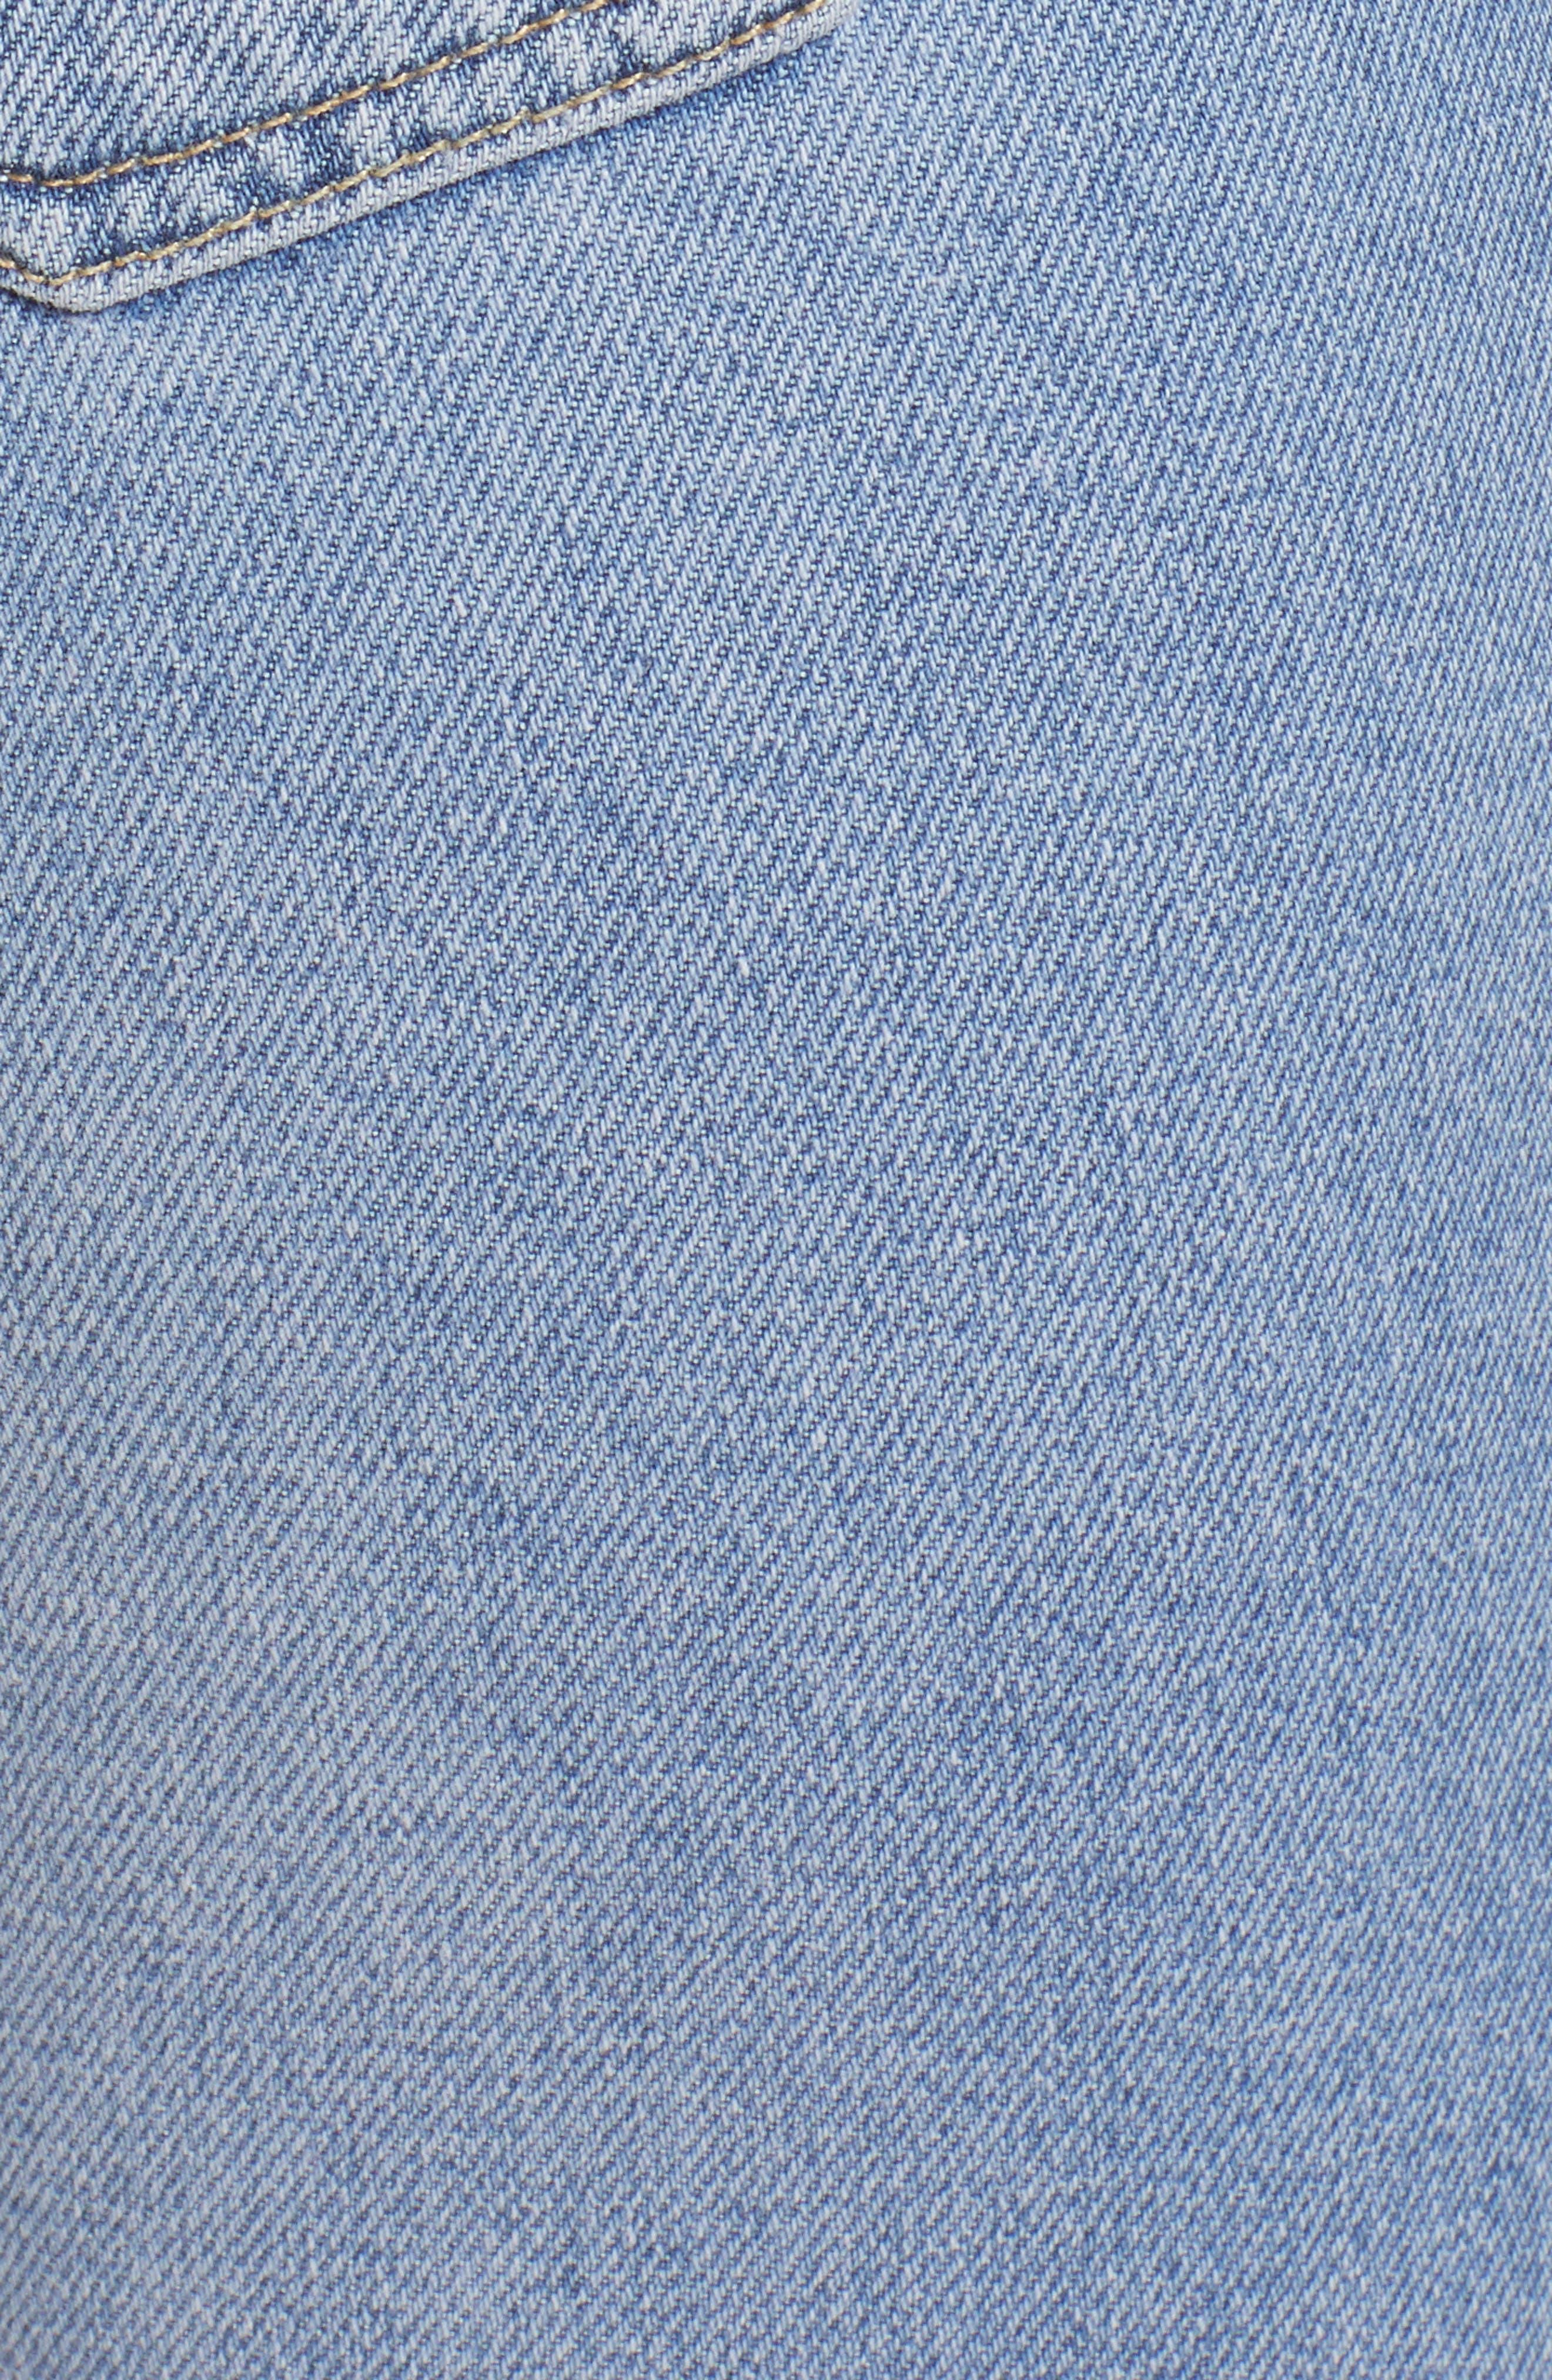 Moto Crop Straight Leg Jeans,                             Alternate thumbnail 6, color,